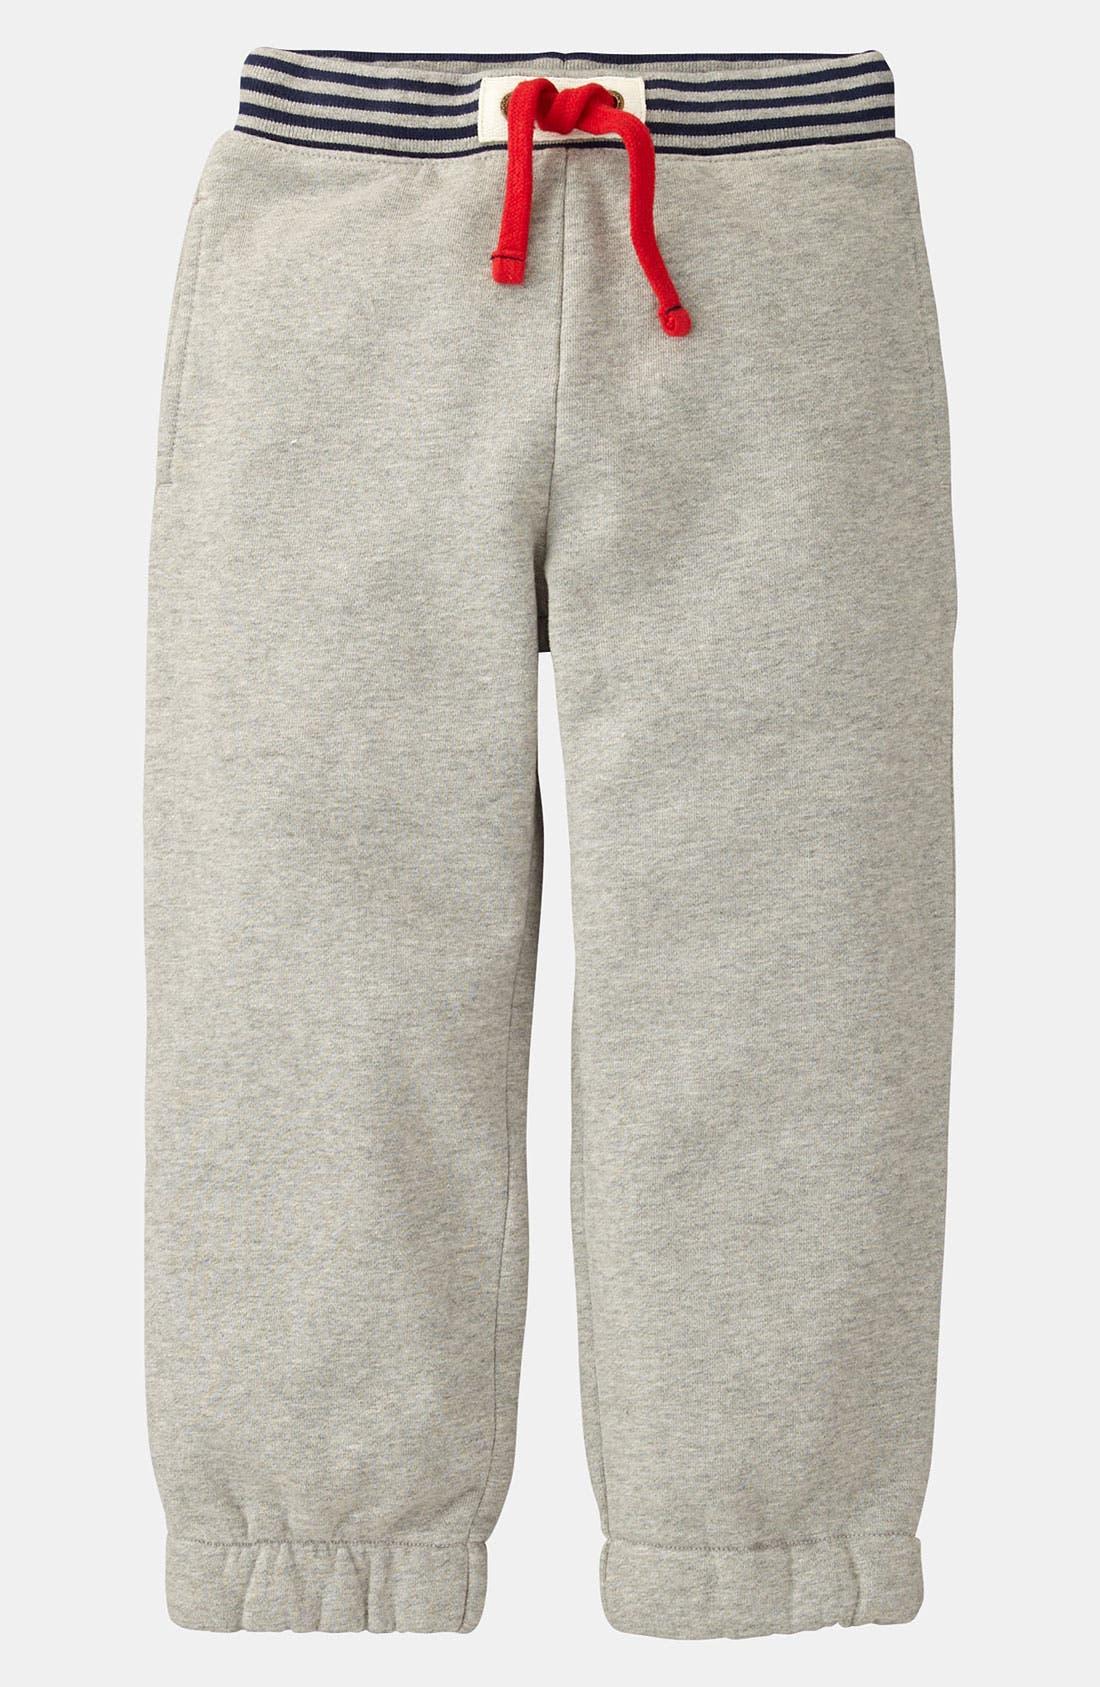 Main Image - Mini Boden 'Track' Pants (Toddler)